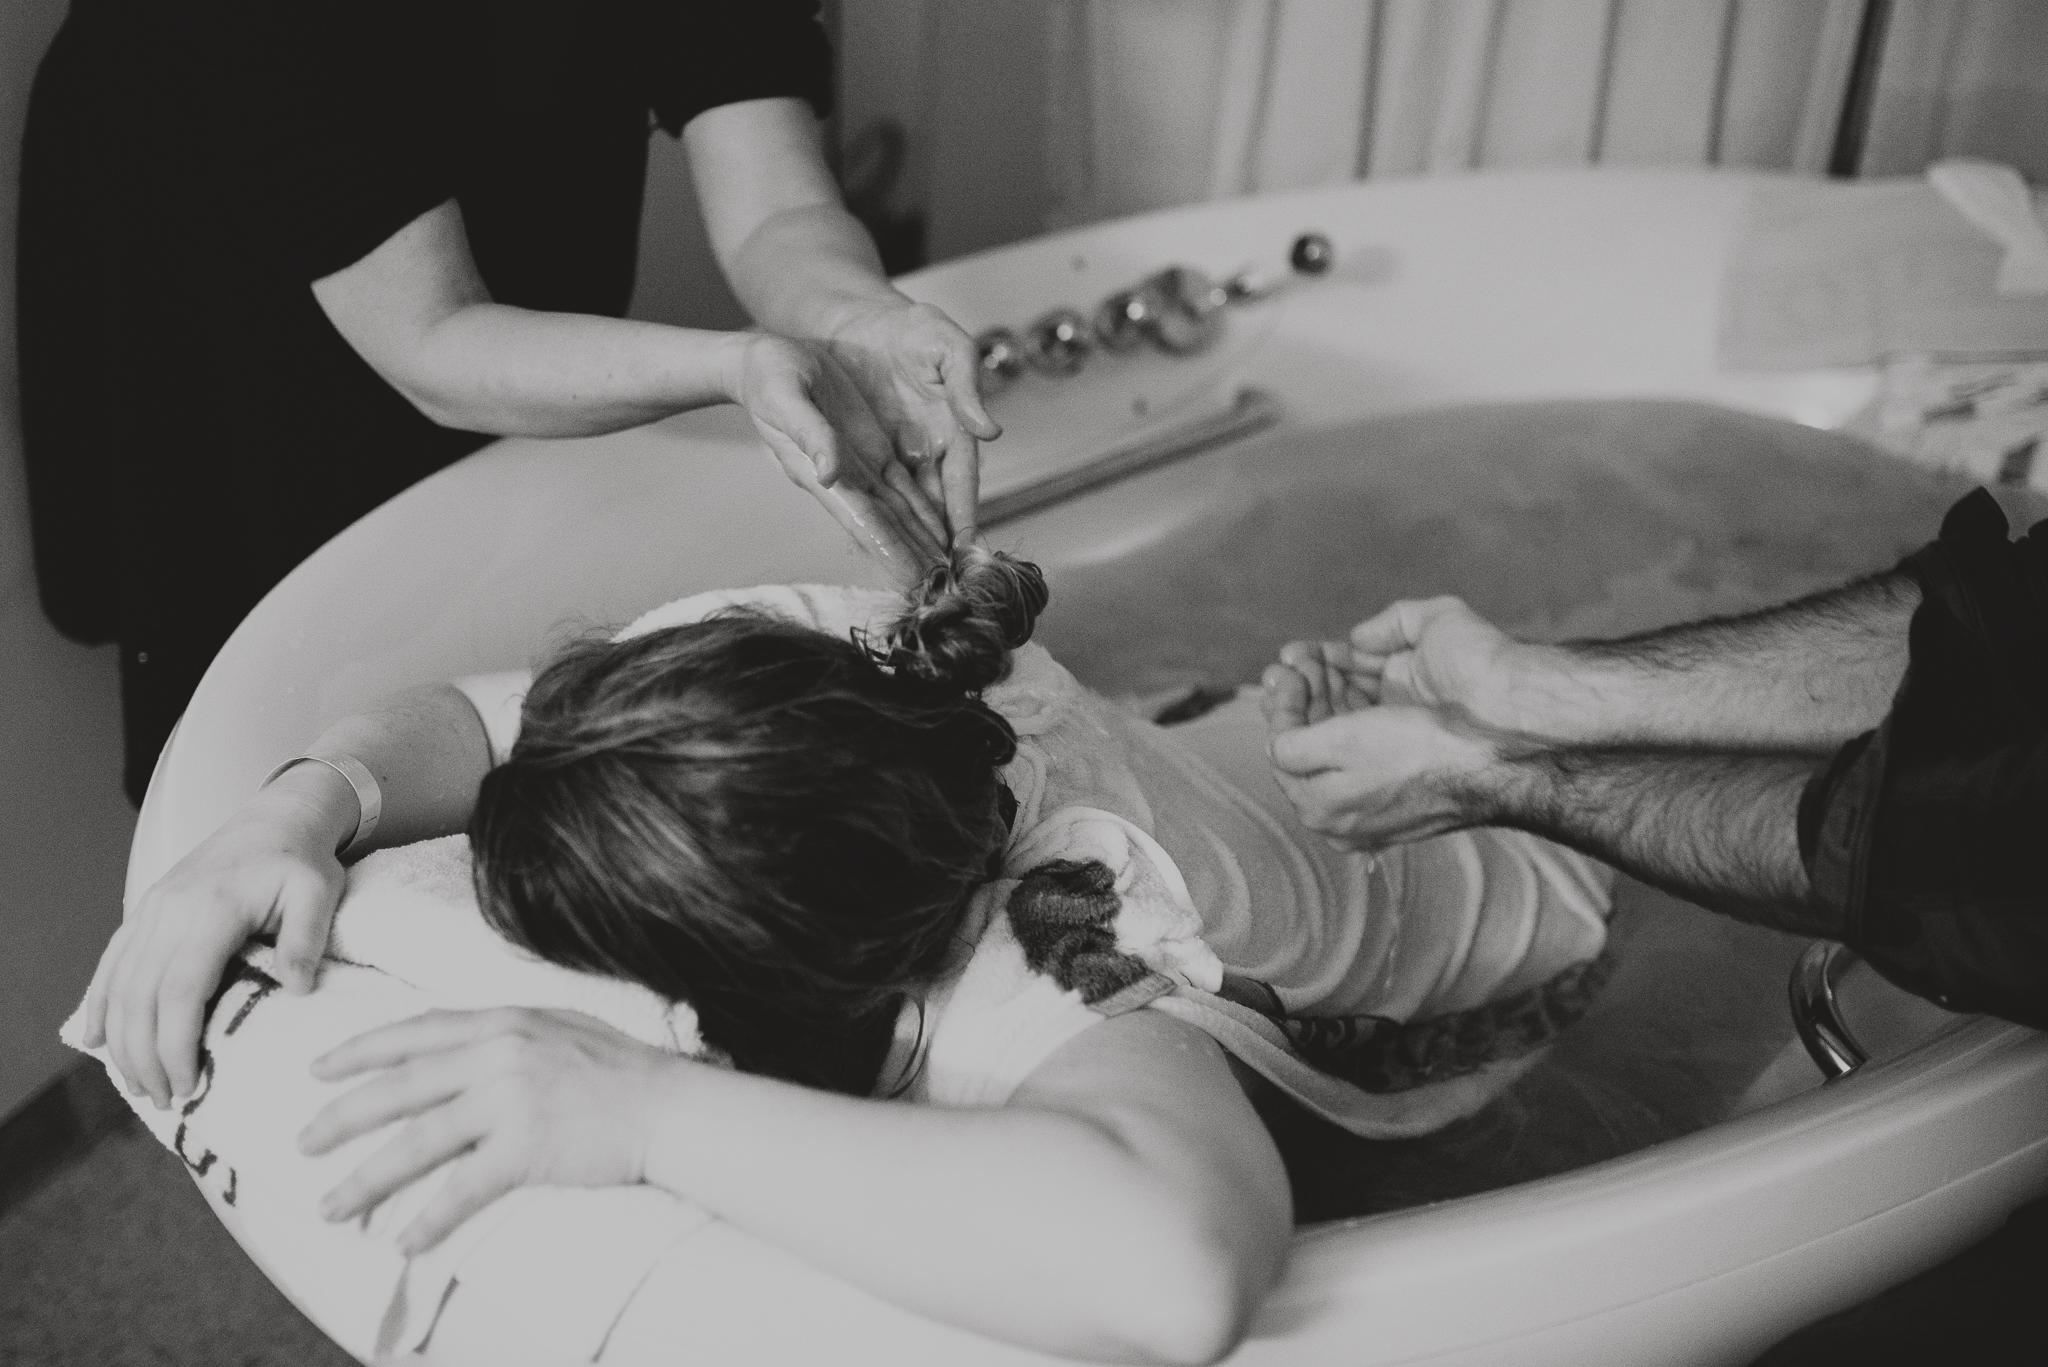 nyfødtfotografering-fødselsfotografering-babyfotografering-maria-vatne-kongsberg-oslo-34.jpg